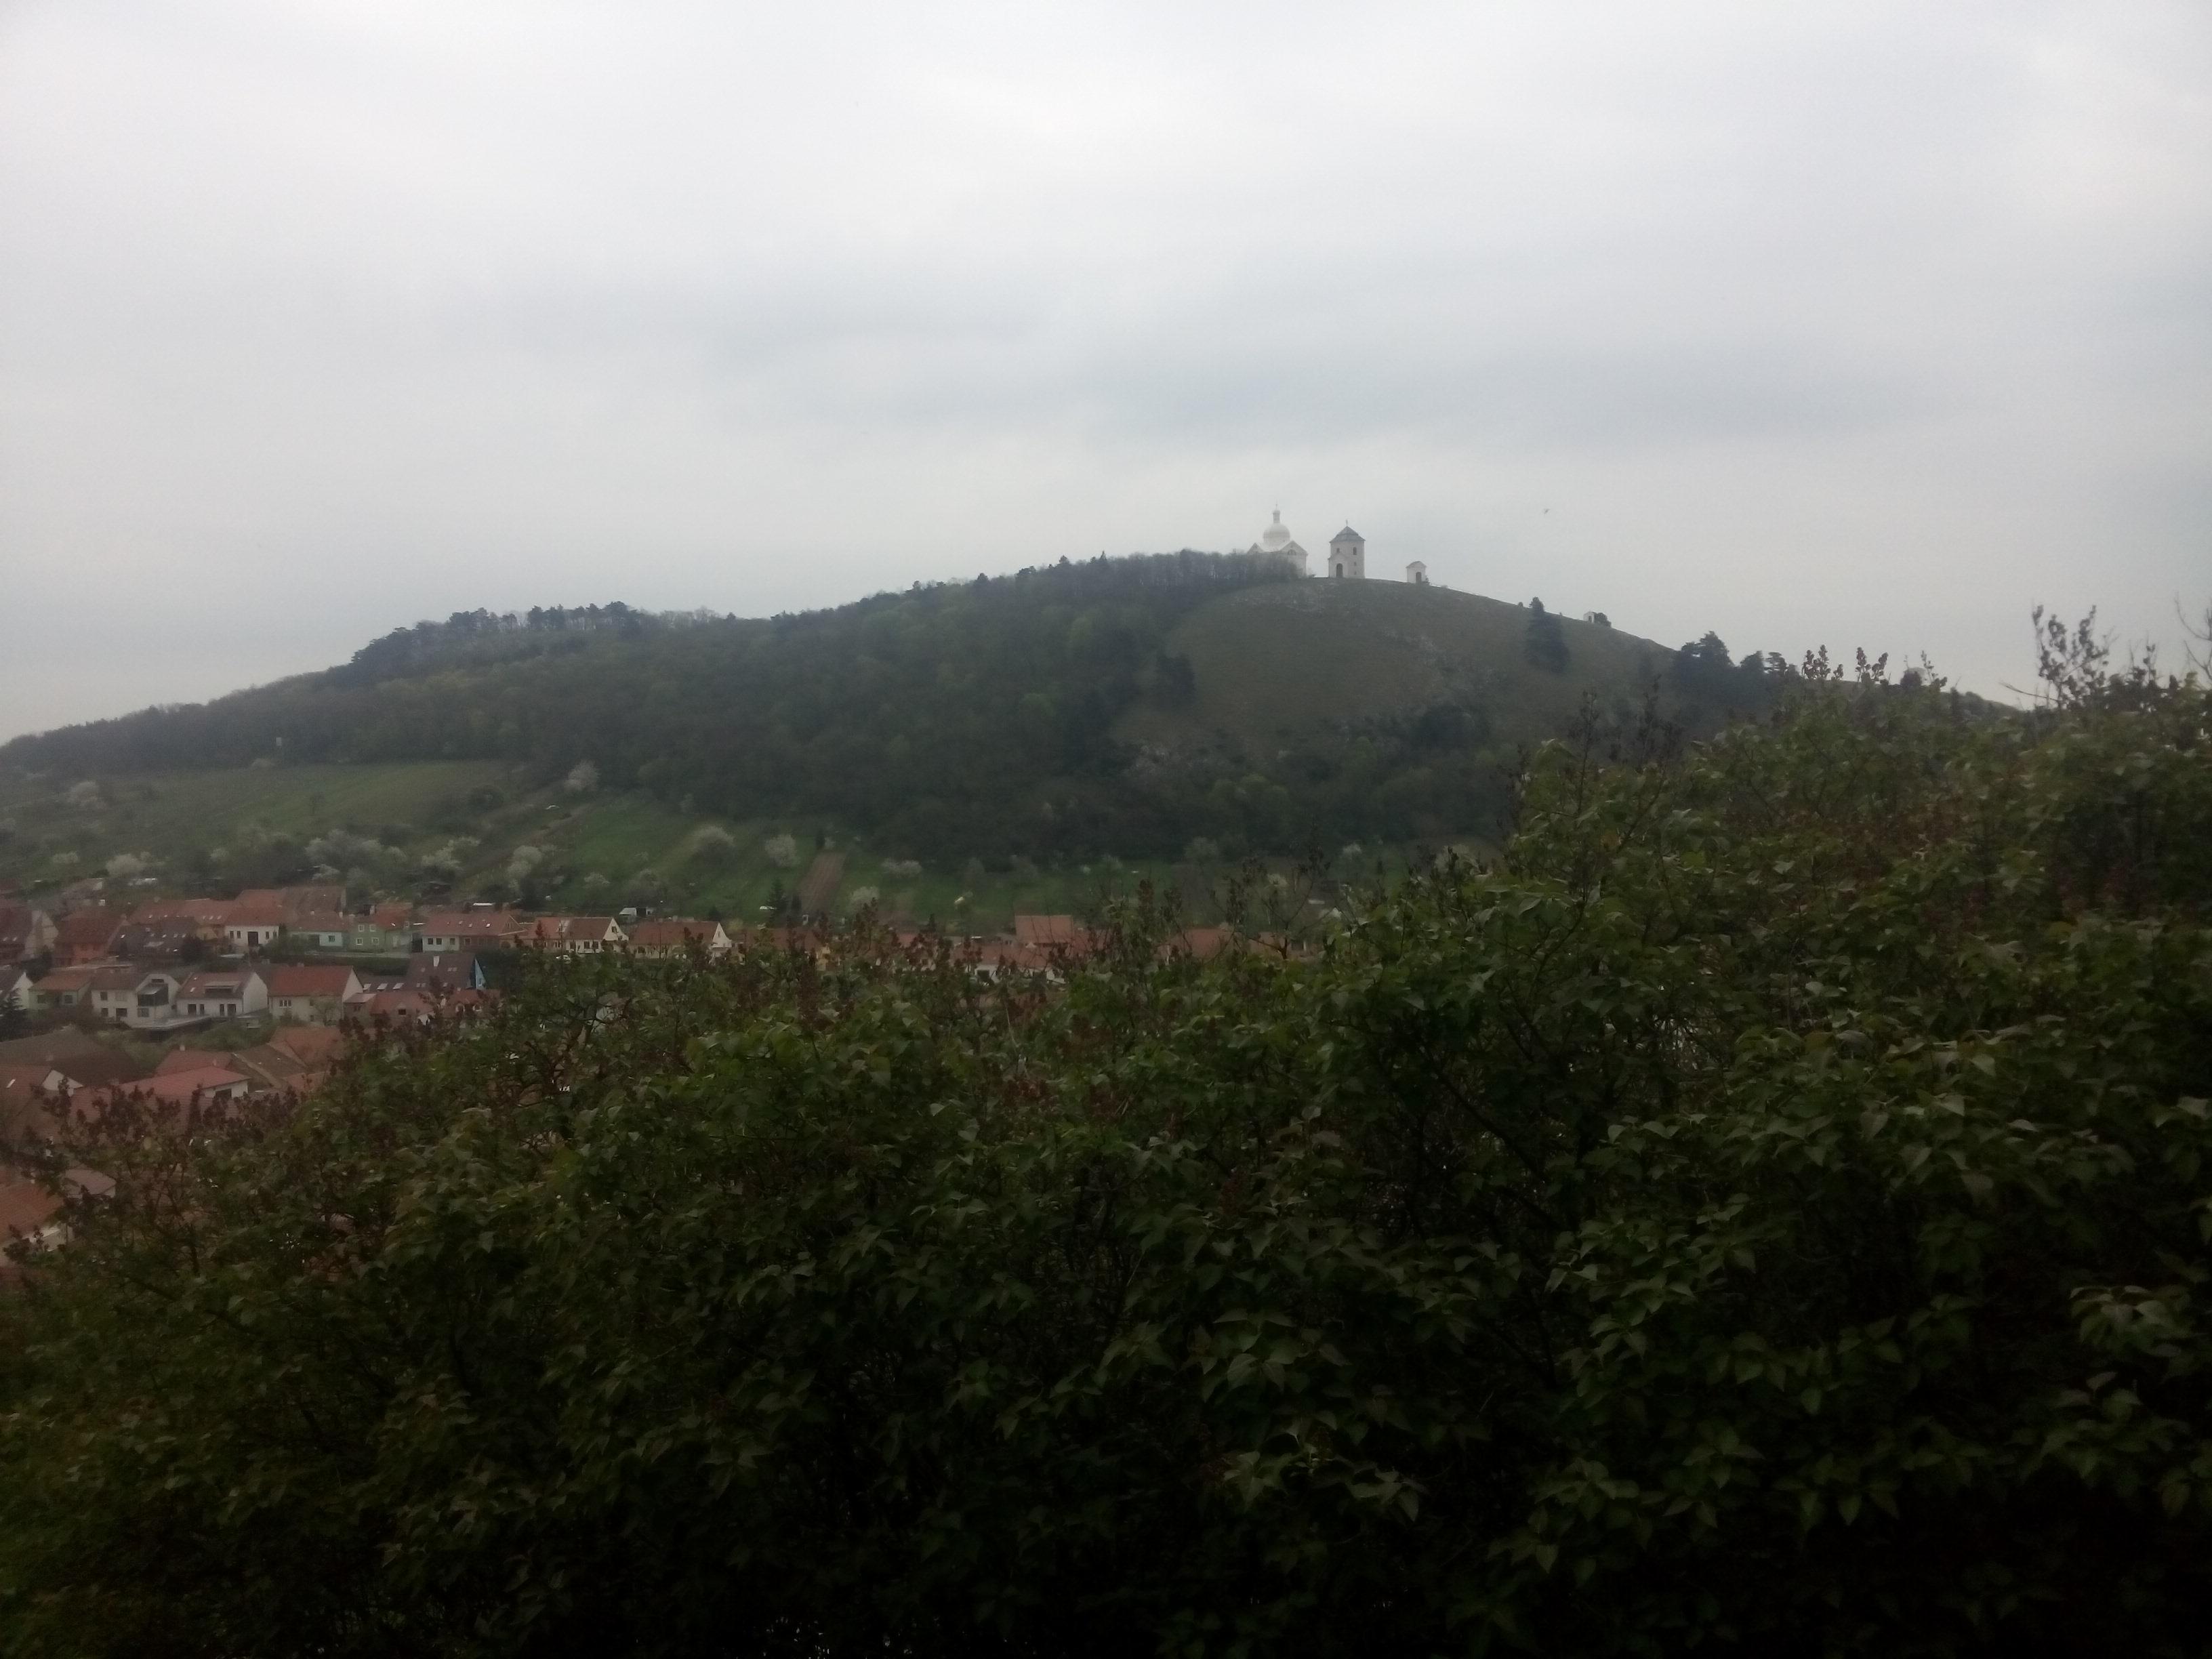 https://i.amy.gy/201804-slovakia-austria-czech/IMG_20180416_180727.jpg